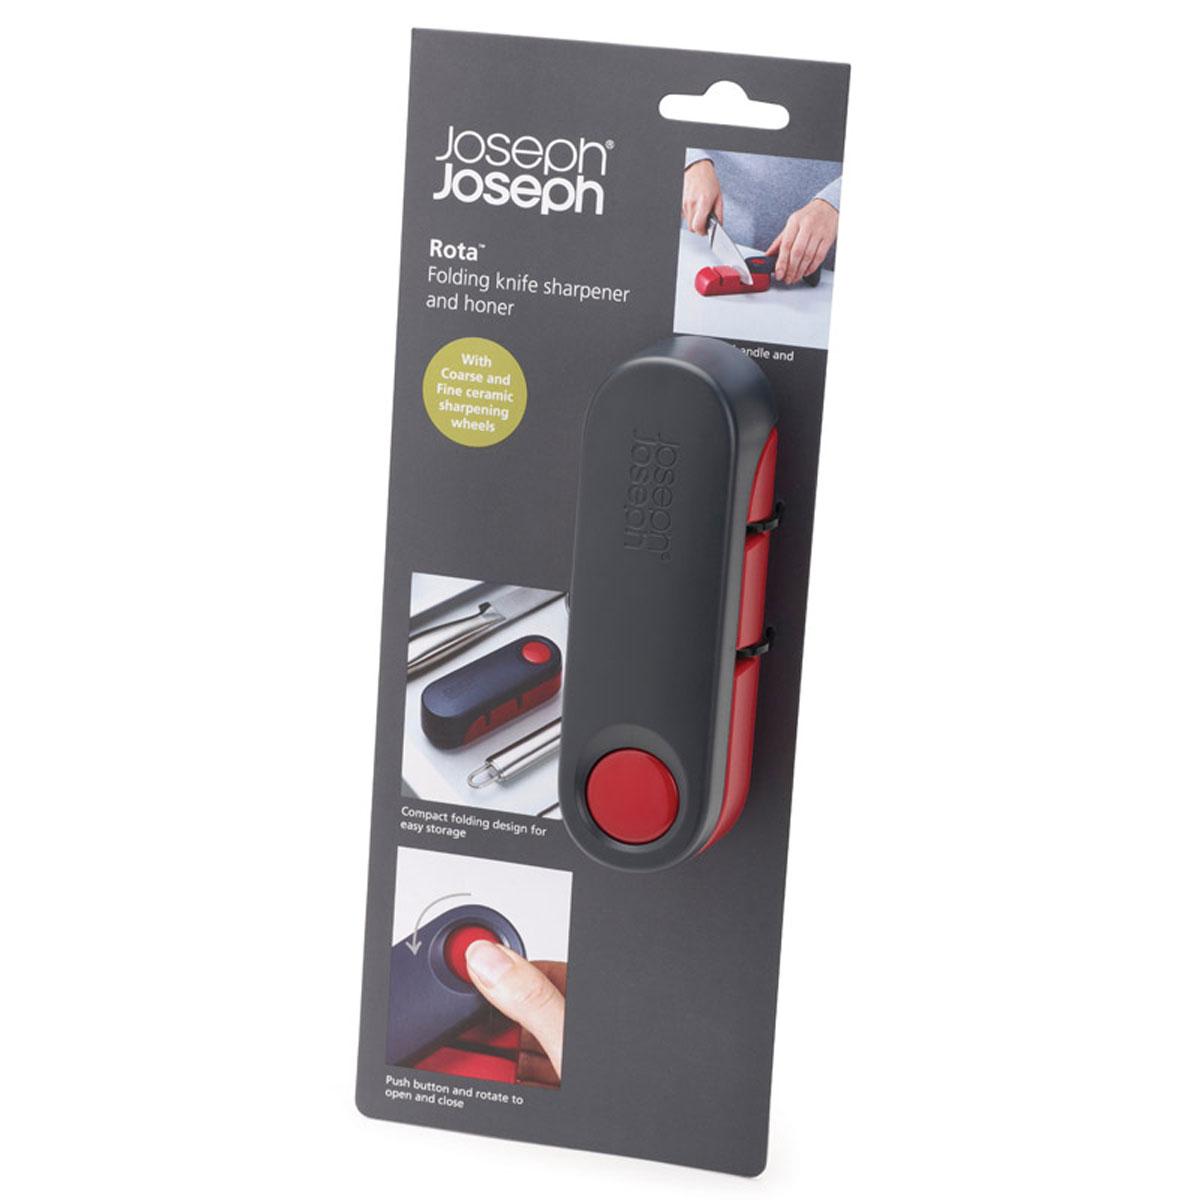 Ножеточка Joseph Joseph Rota, цвет: темно-серый, красный